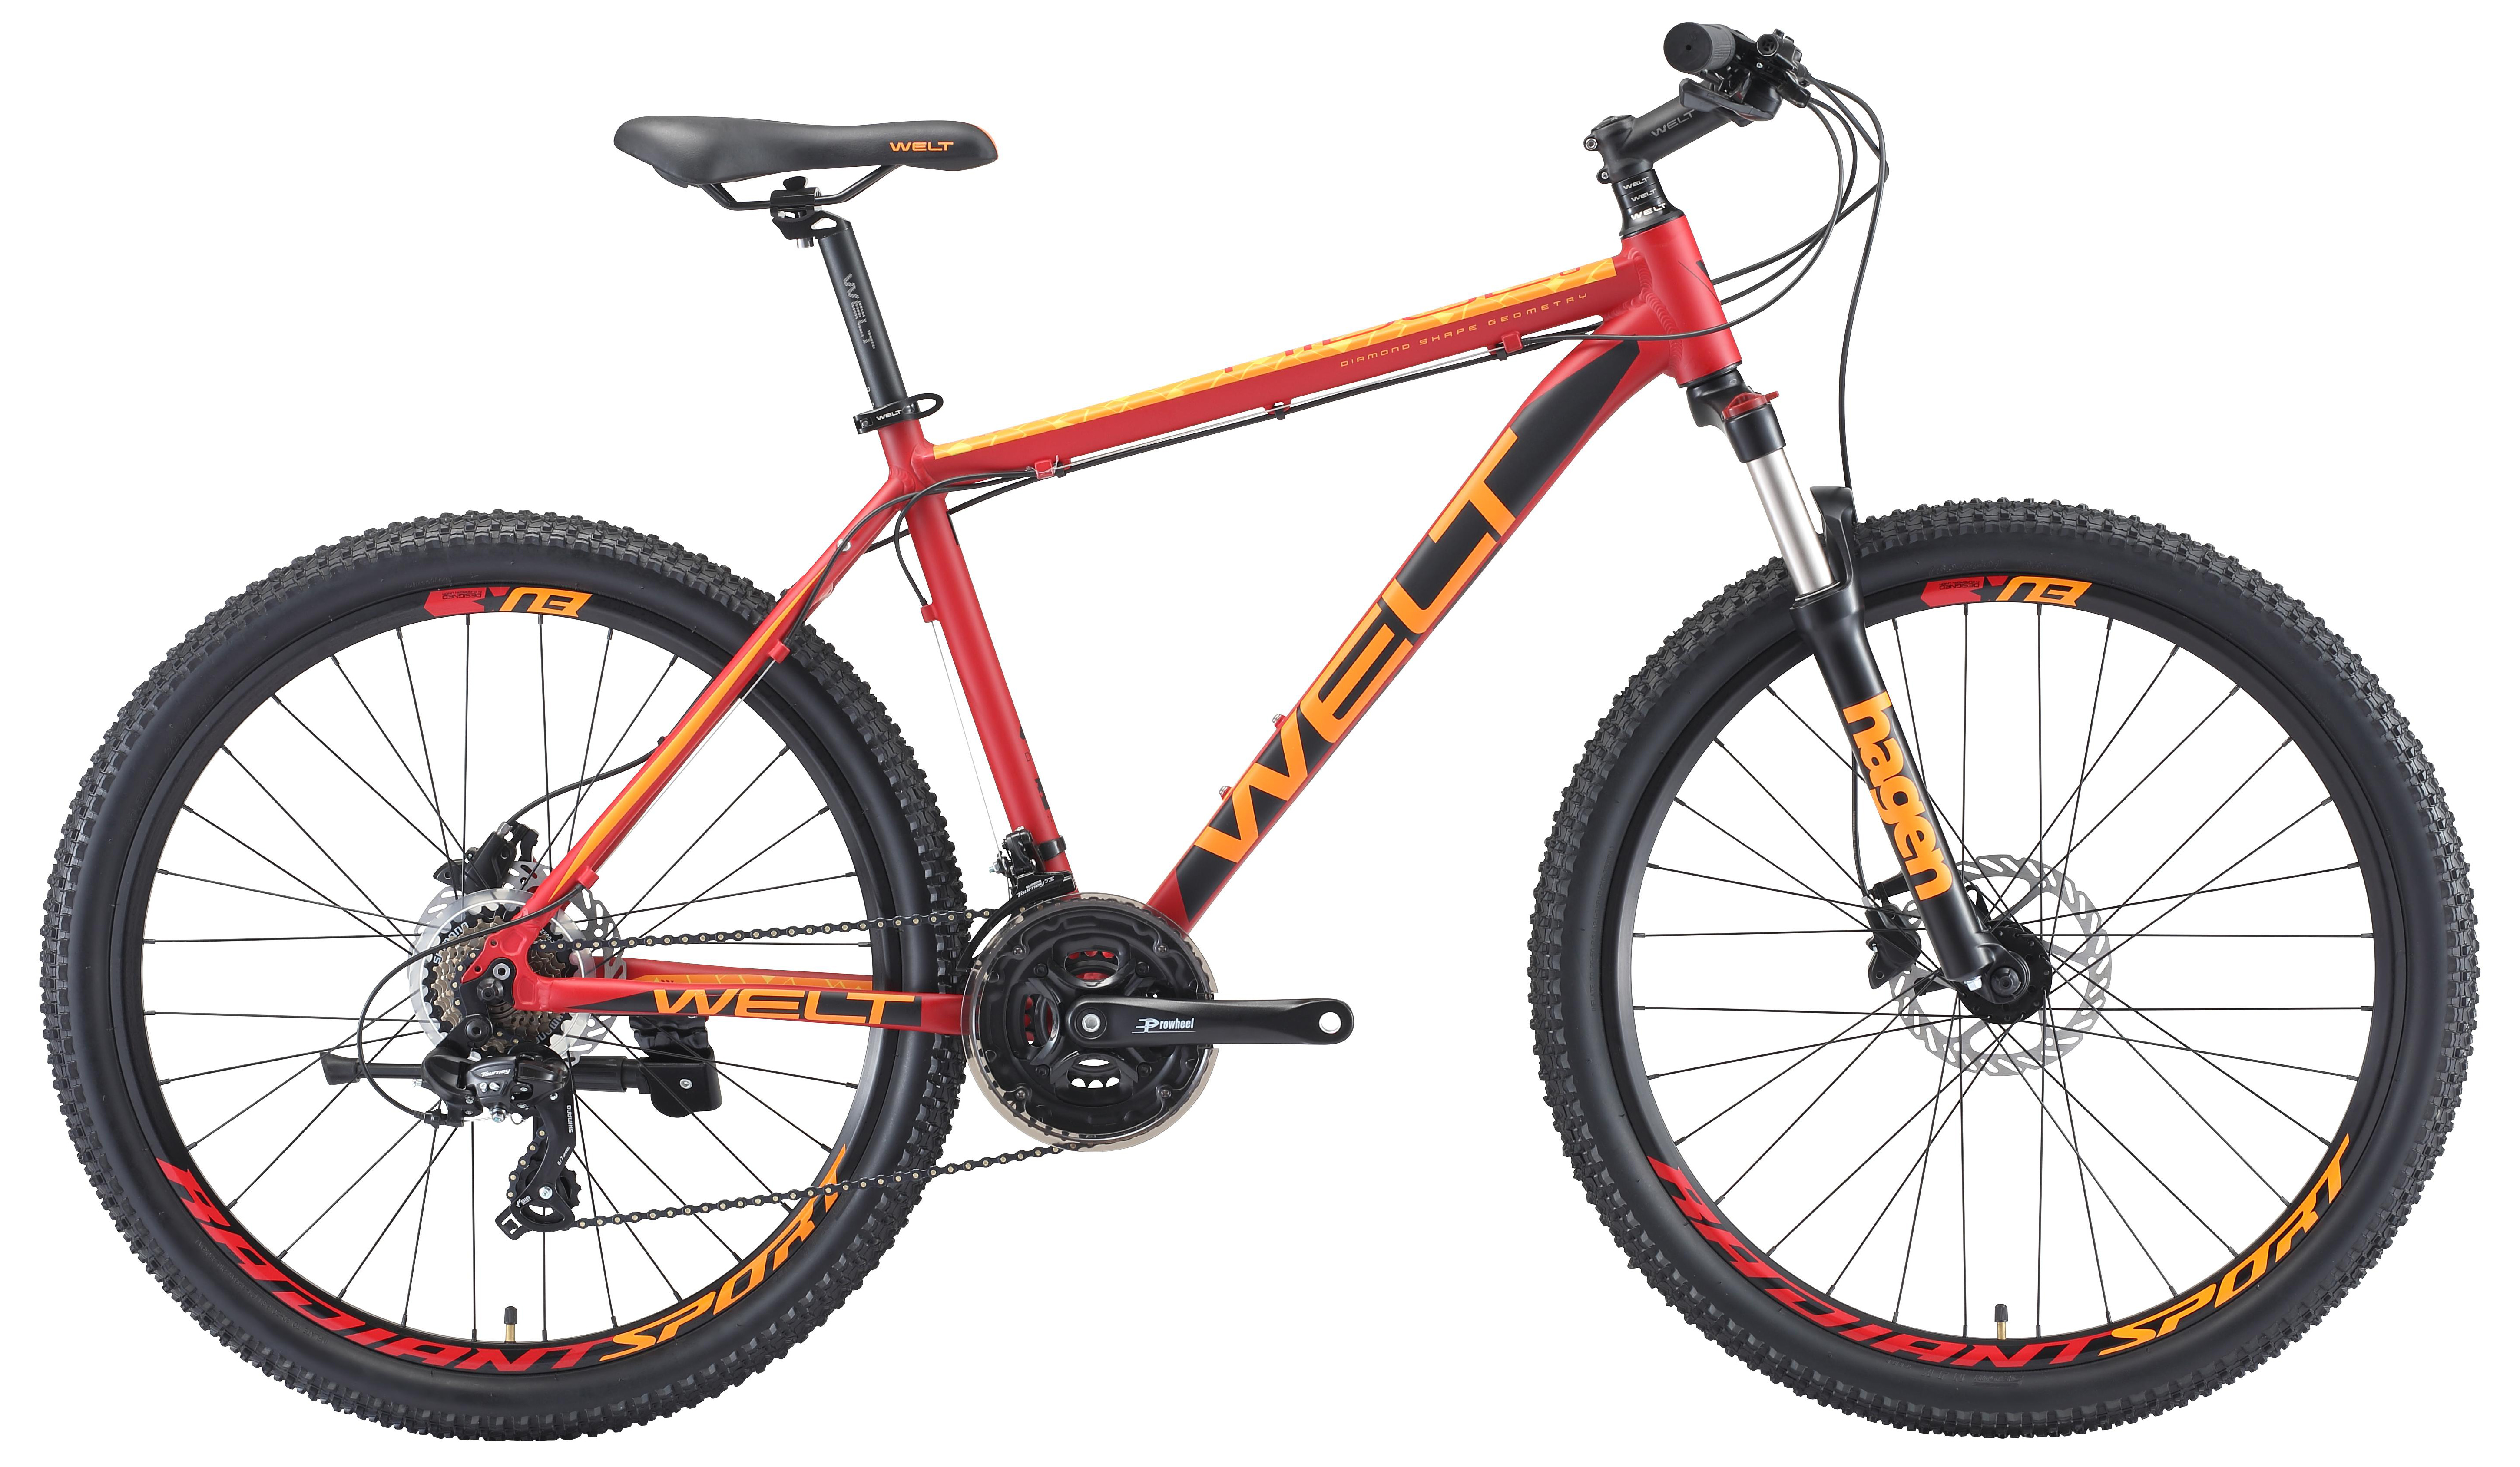 Велосипед Welt Ridge 1.0 HD 2019 велосипед welt ridge 1 0 hd 2018